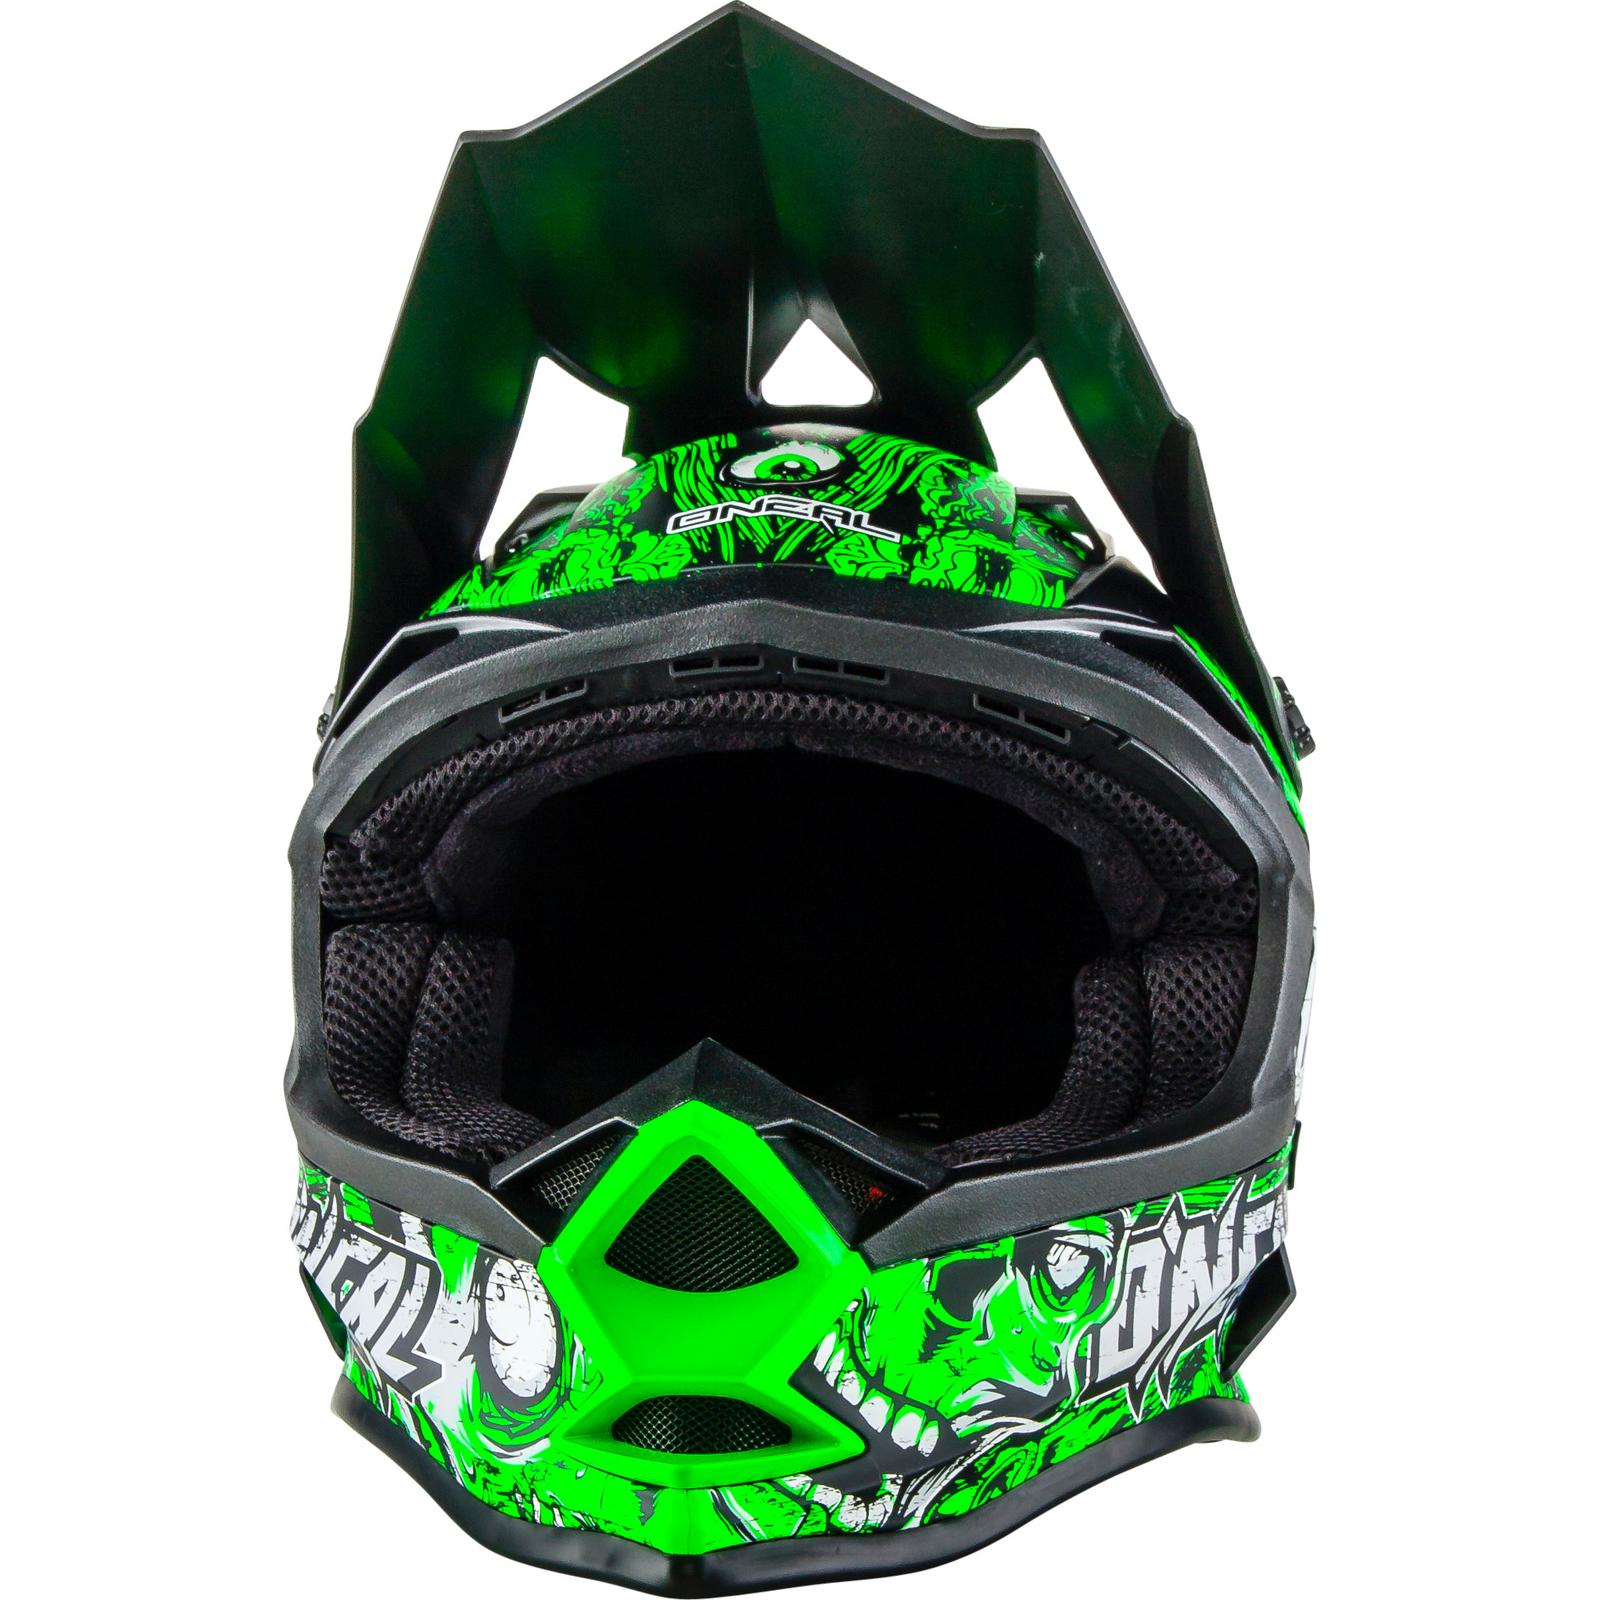 ... > Clothing, Helmets & Protection > Helmets & Headwear > ...